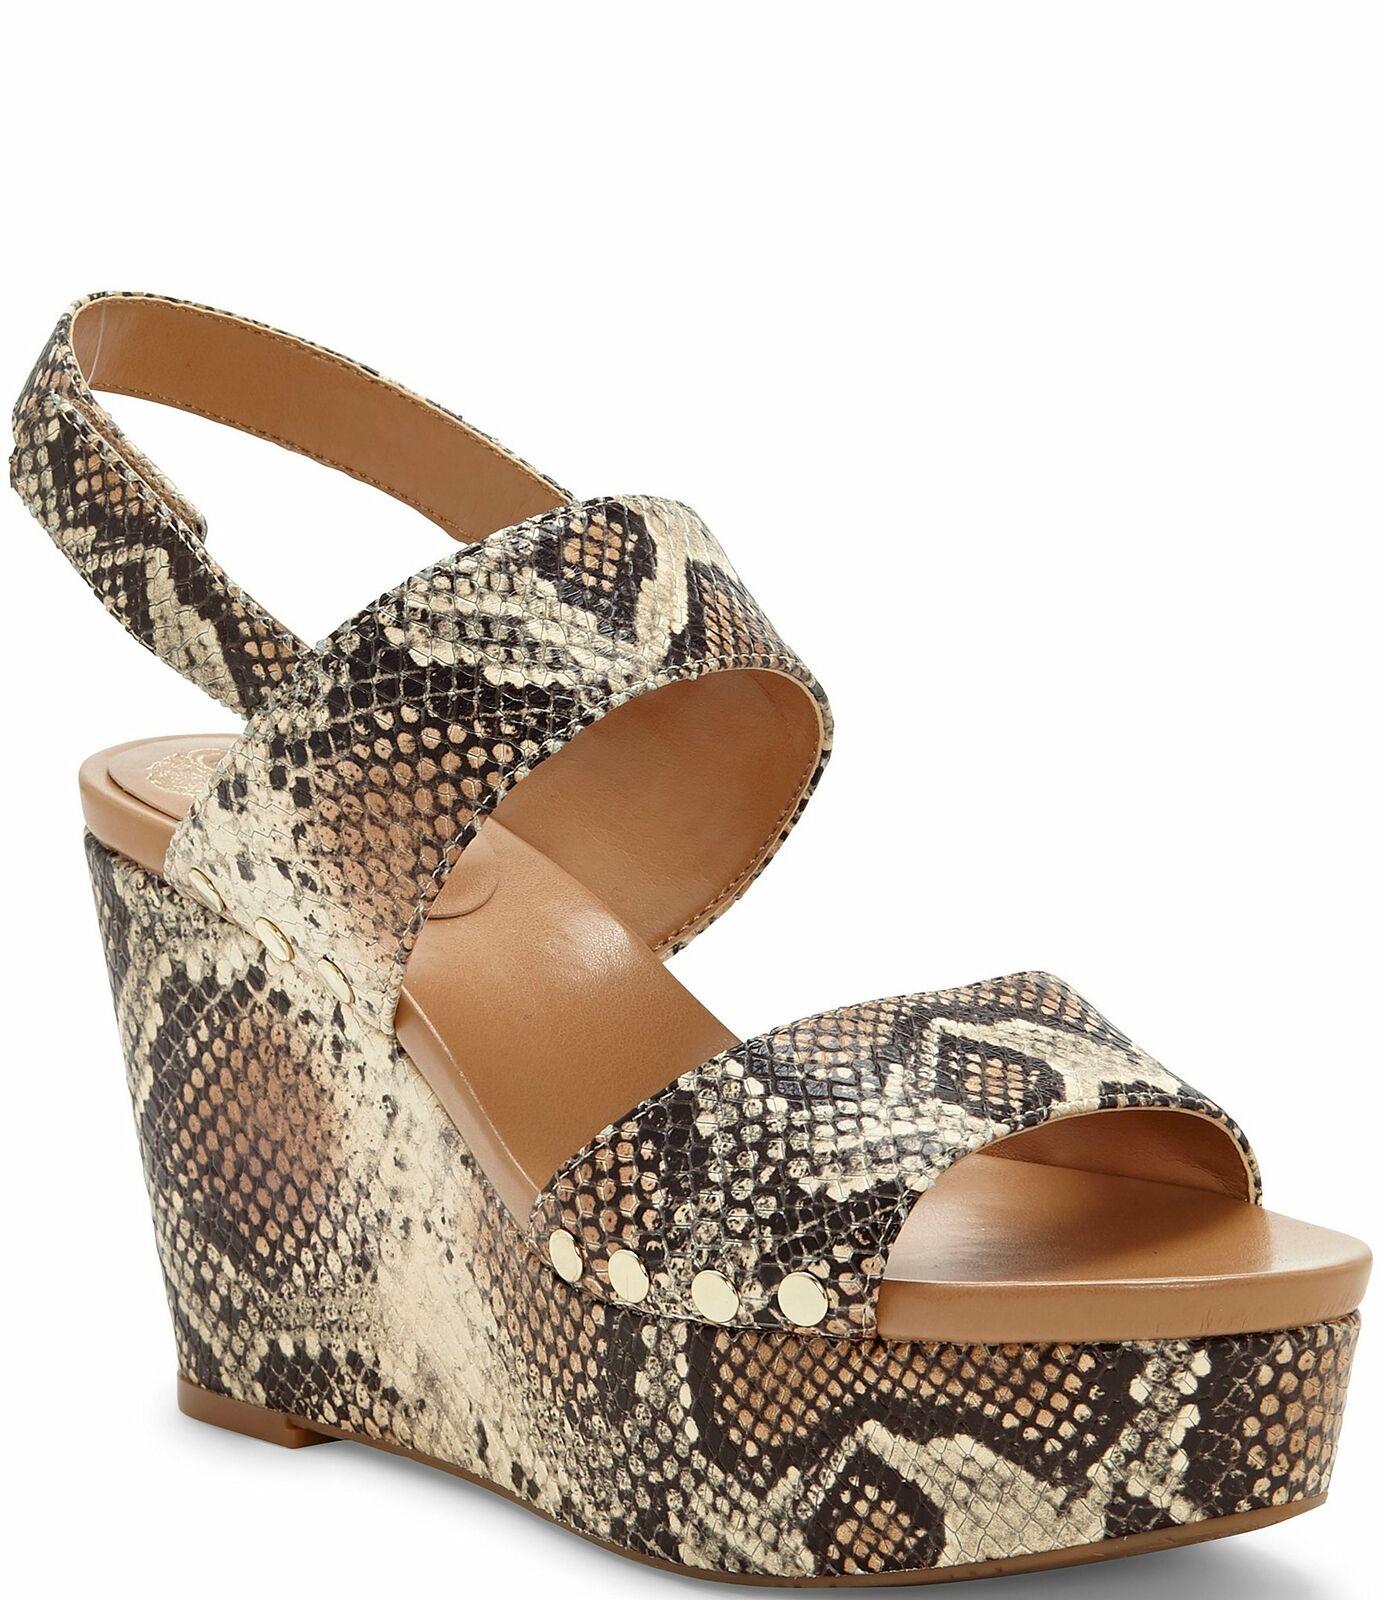 Vince Camuto Ventinda Snake Leather Platform 2 piece Wedge Sandals 9.5 NEW